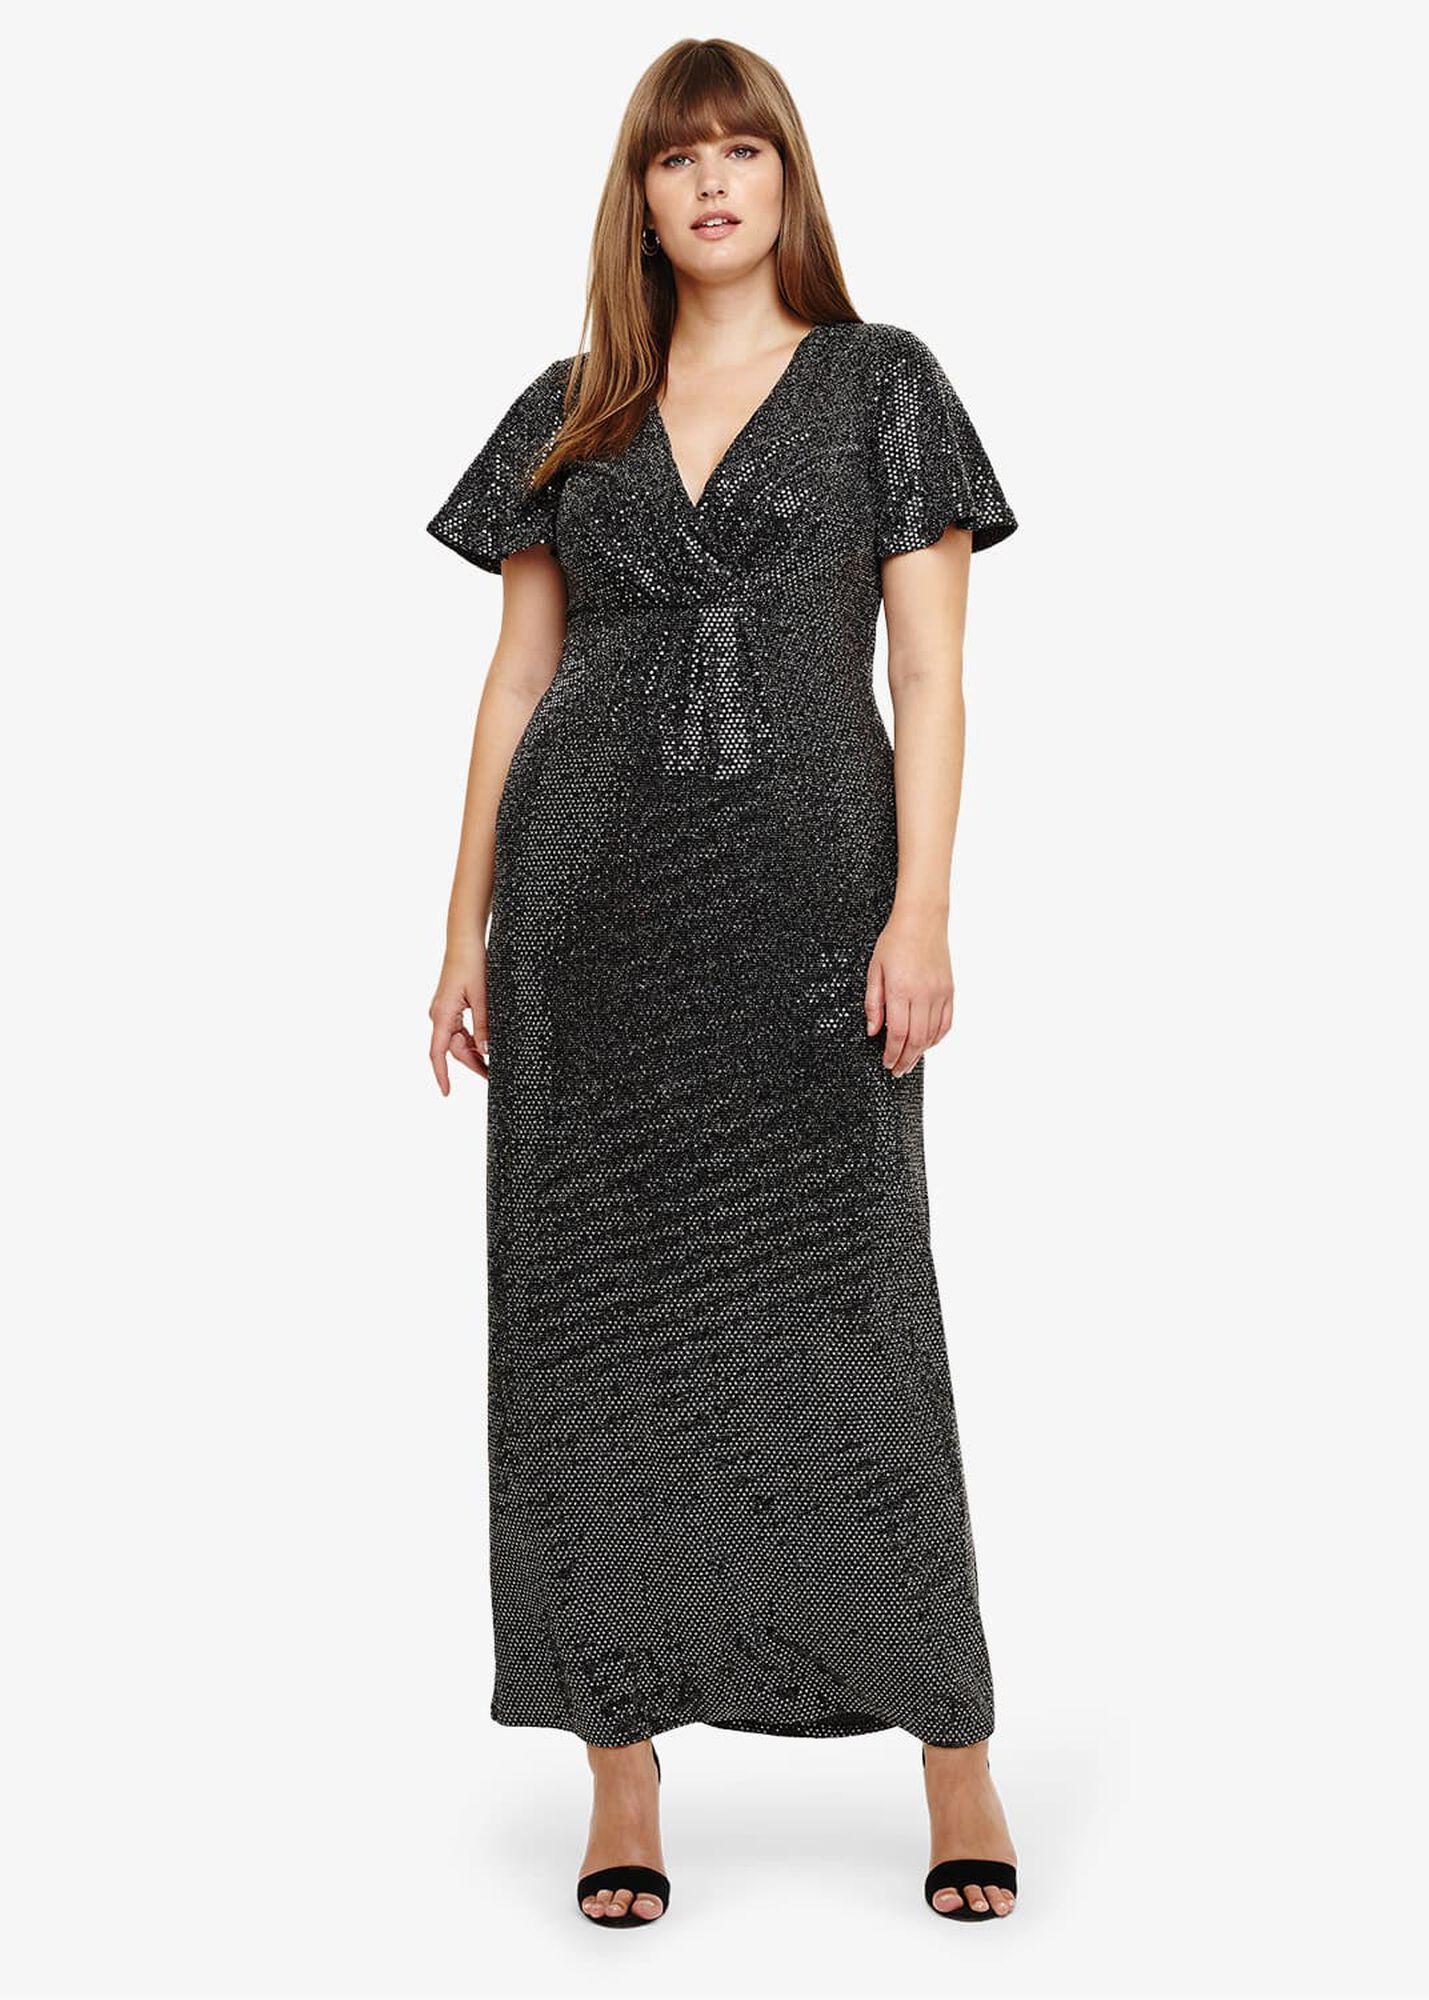 Galaxy Sparkle Maxi Dress | Phase Eight | Phase Eight